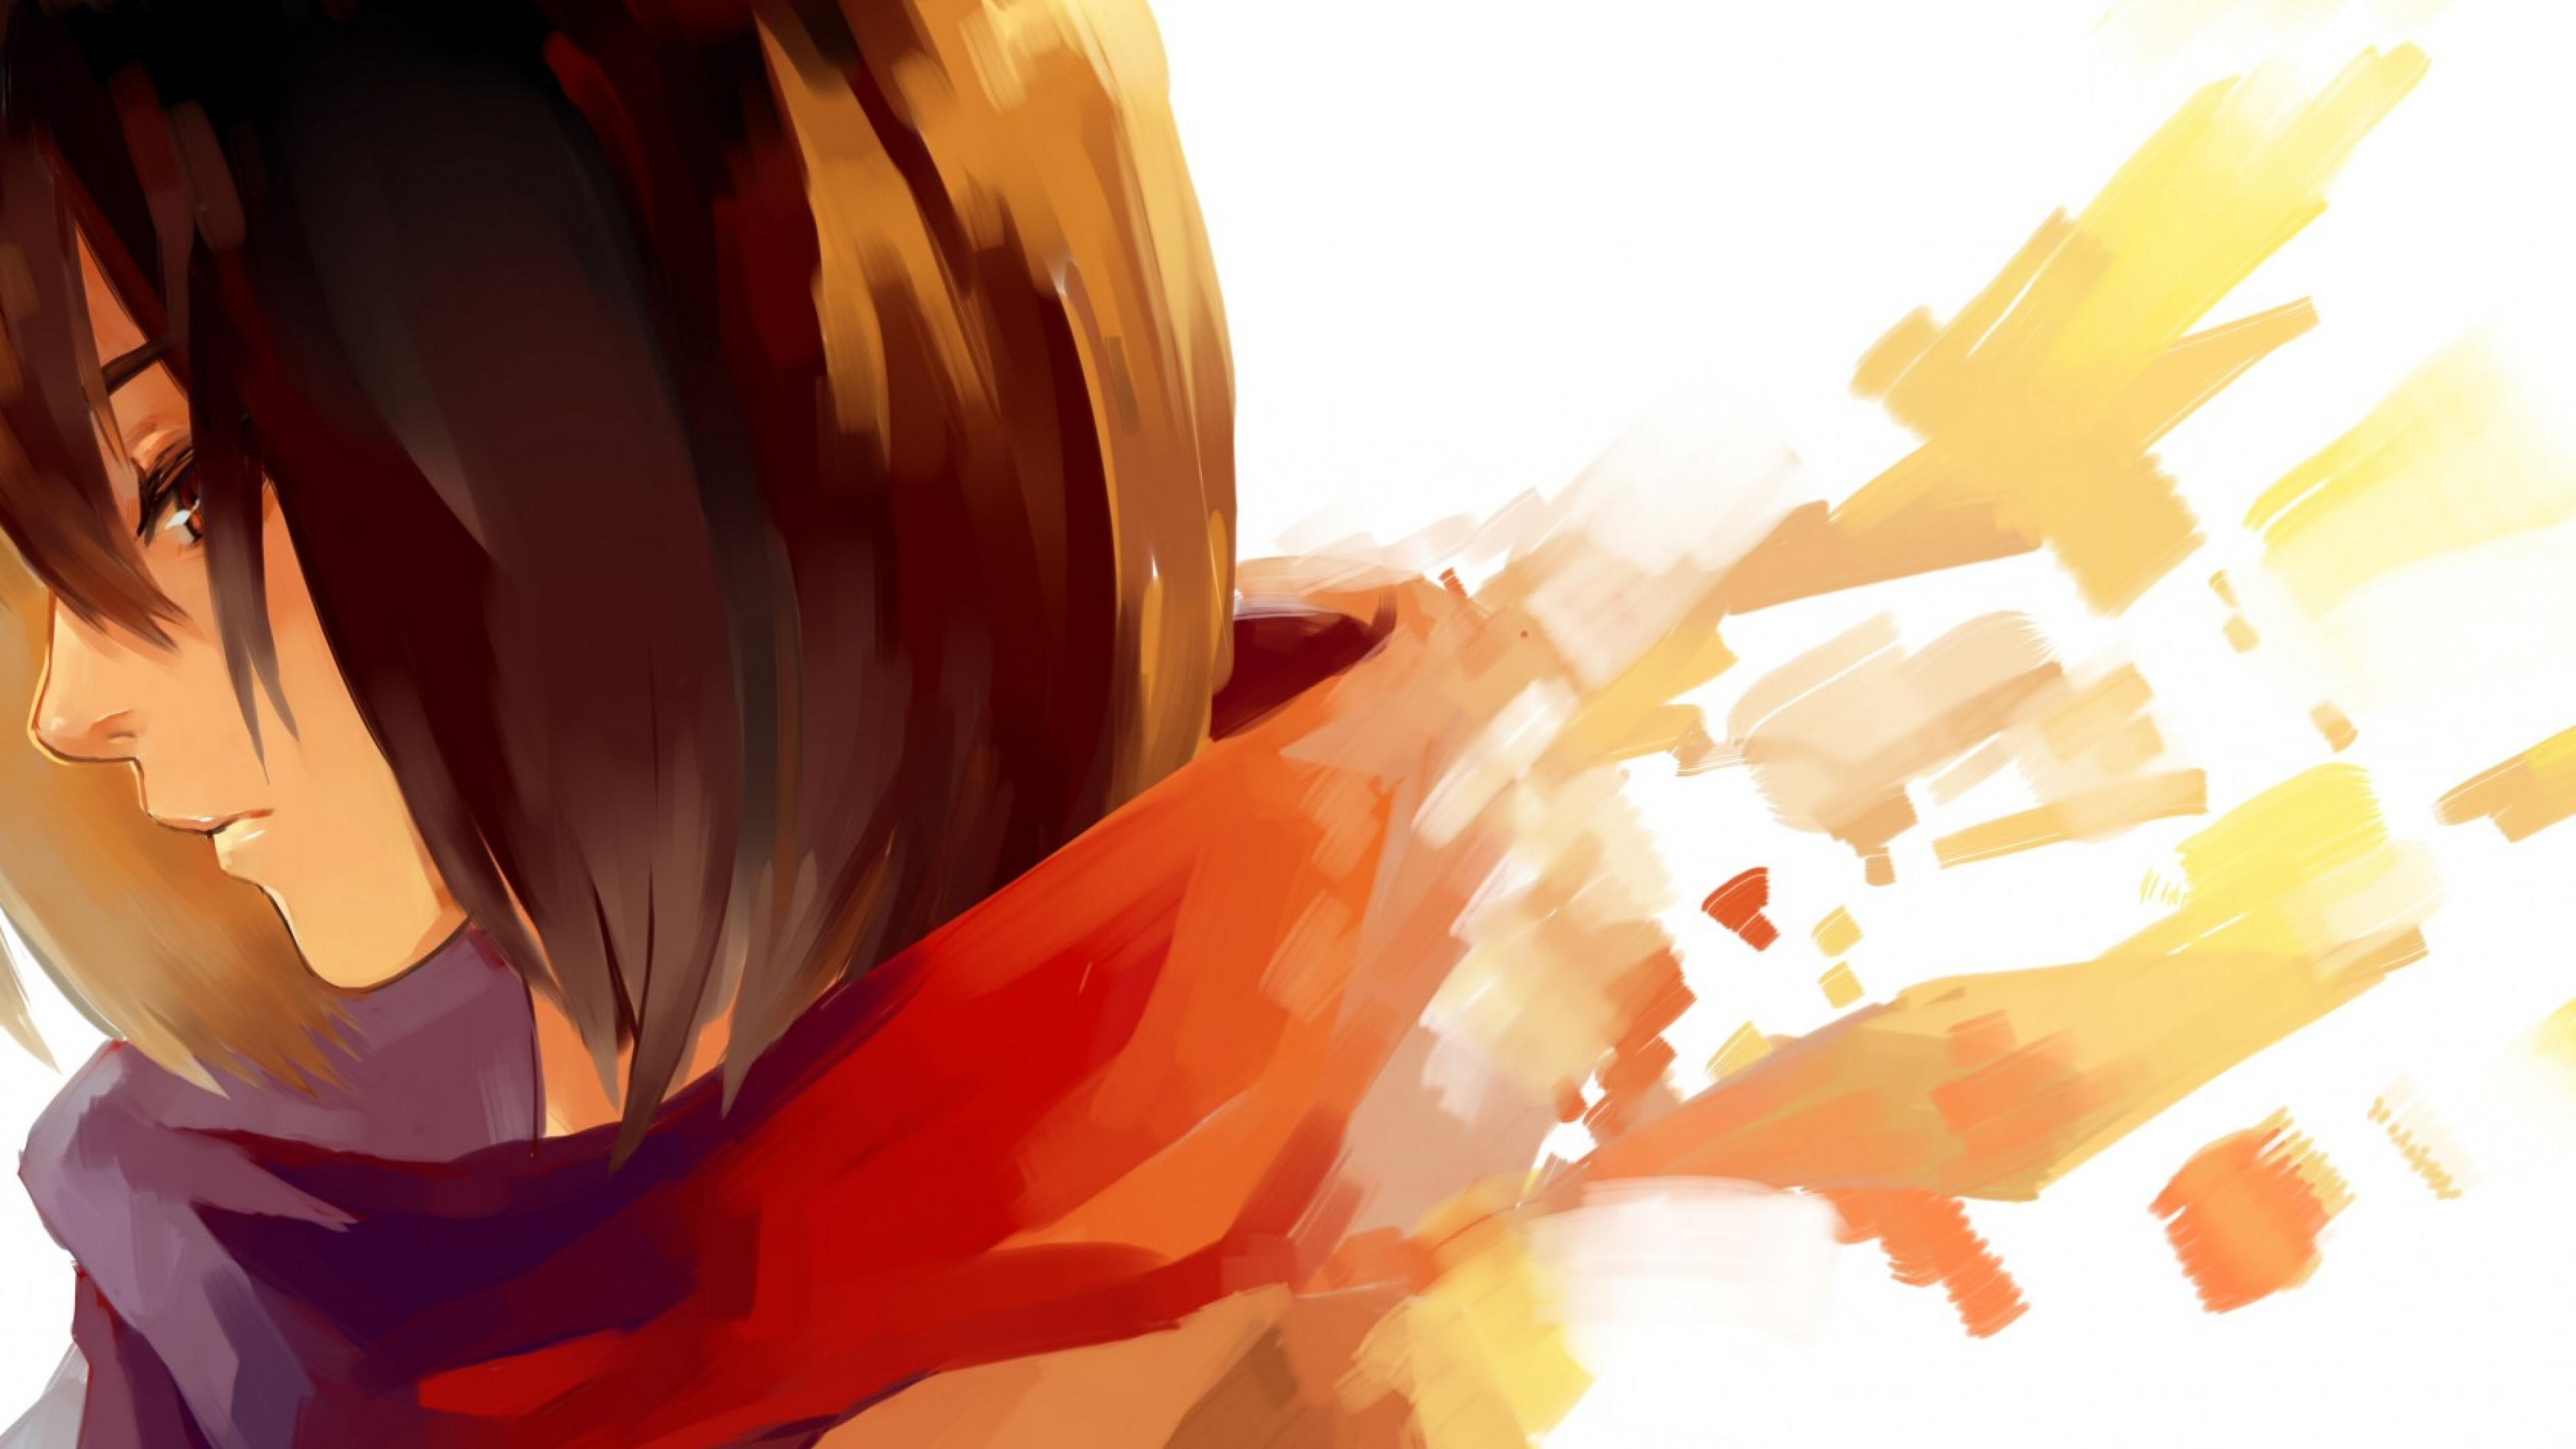 girlcolorburst